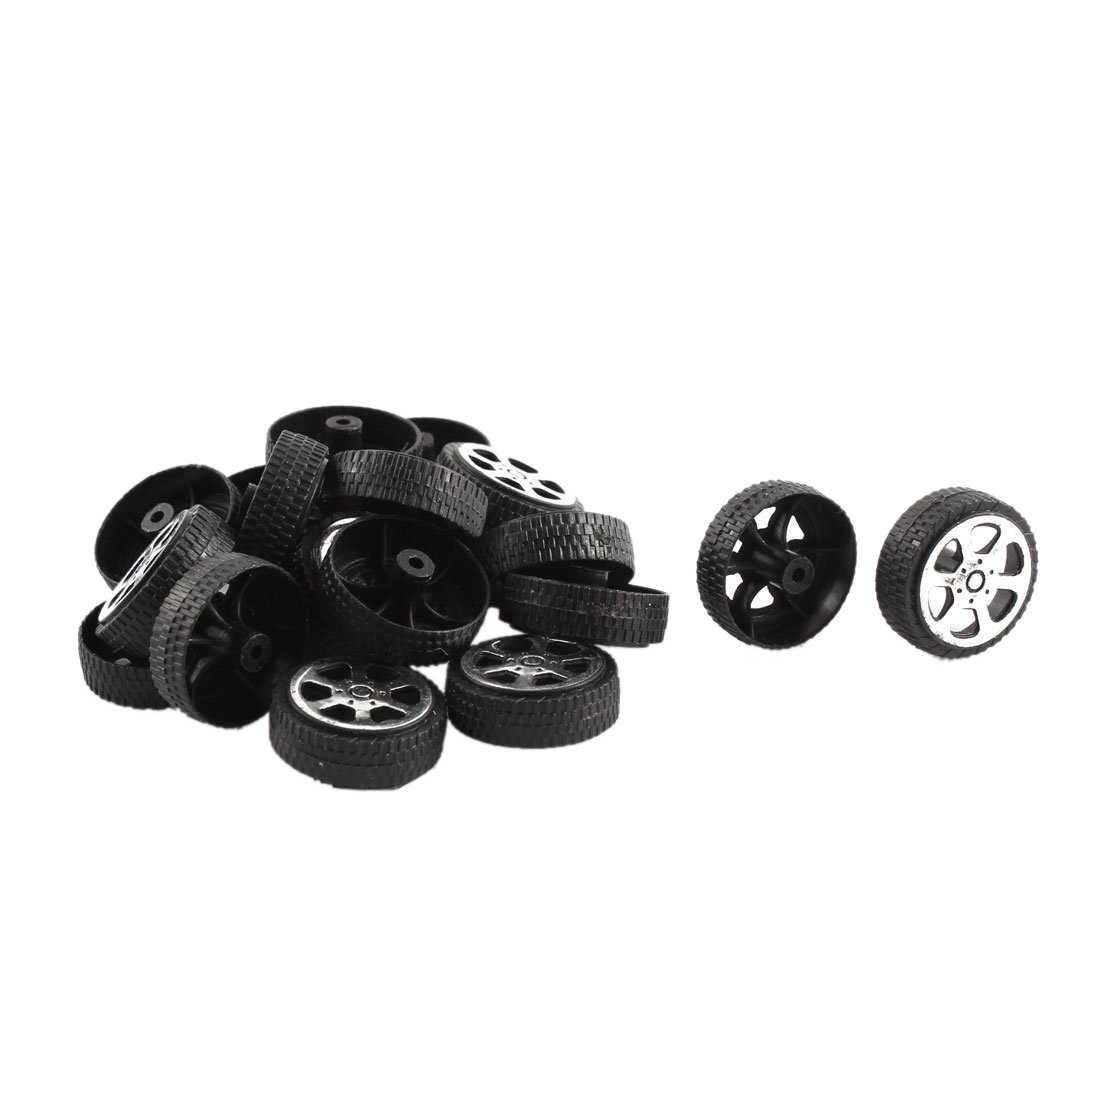 Plastic Roll 2mm Dia Shaft Auto Vrachtwagen Model Speelgoed Wiel 20mm x 6mm 20Pcs